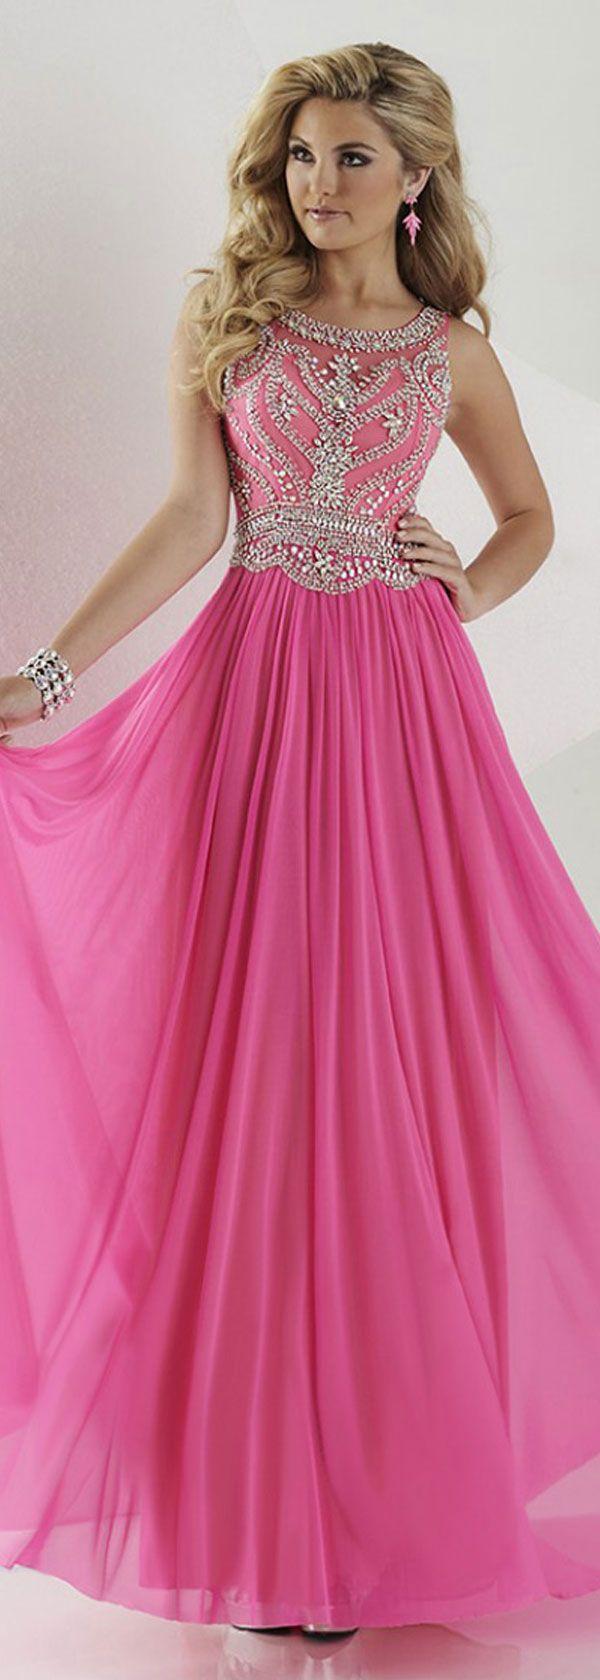 20 best vestidos damas images on Pinterest | Bridesmade dresses ...